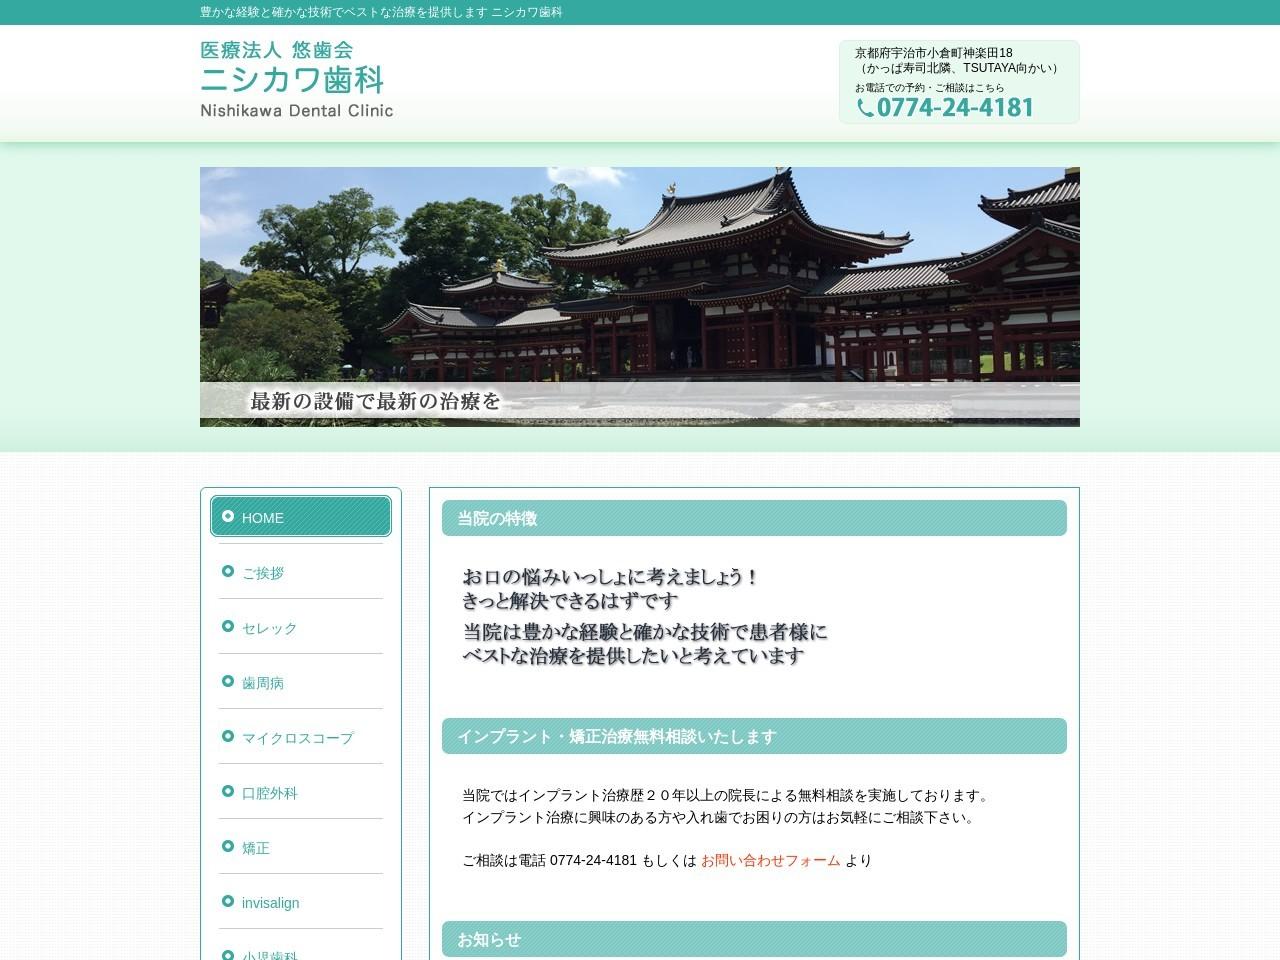 医療法人悠歯会  ニシカワ歯科 (京都府宇治市)